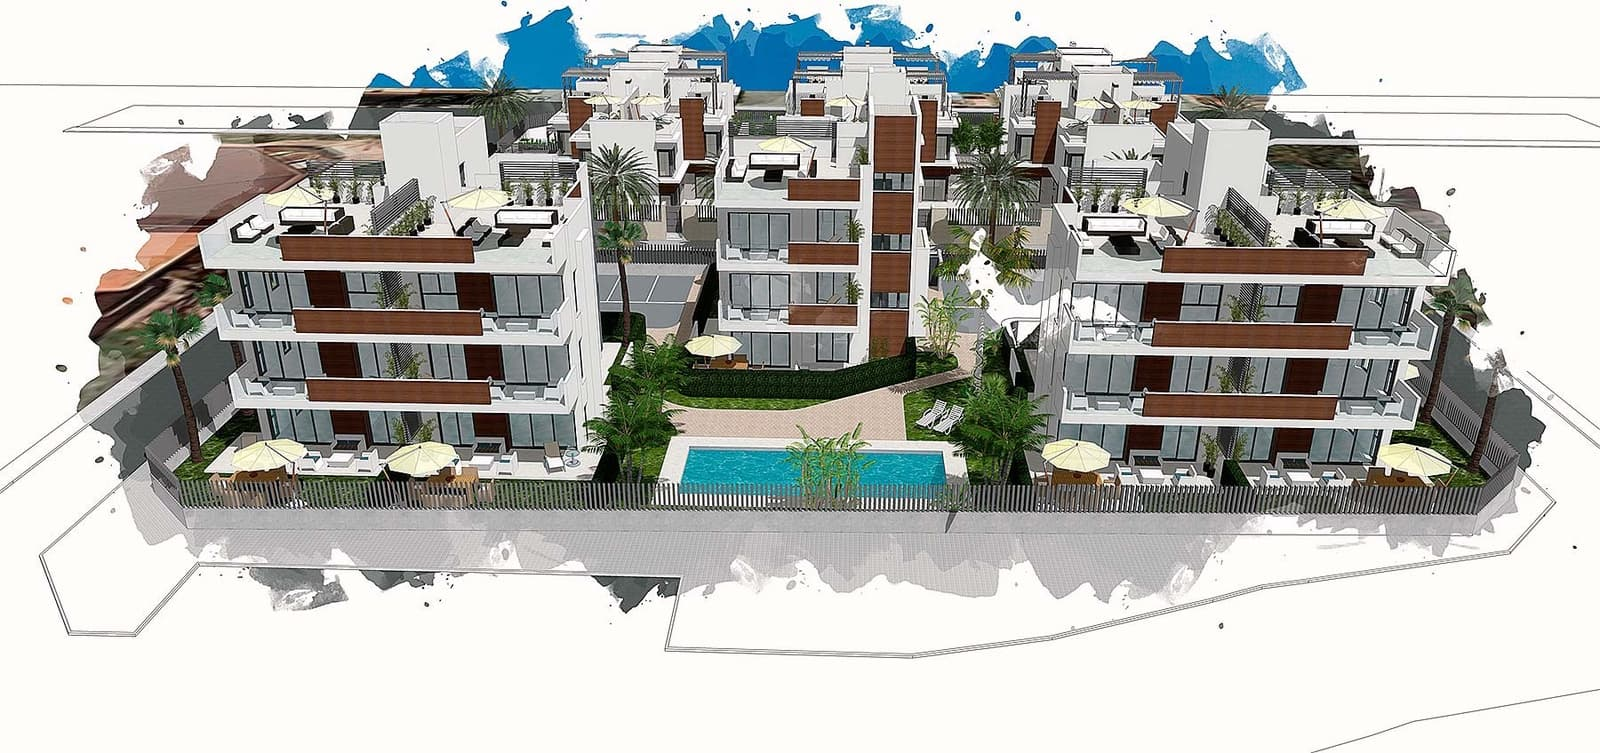 3 sovrum Takvåning till salu i Santiago de la Ribera med pool - 249 900 € (Ref: 5937197)